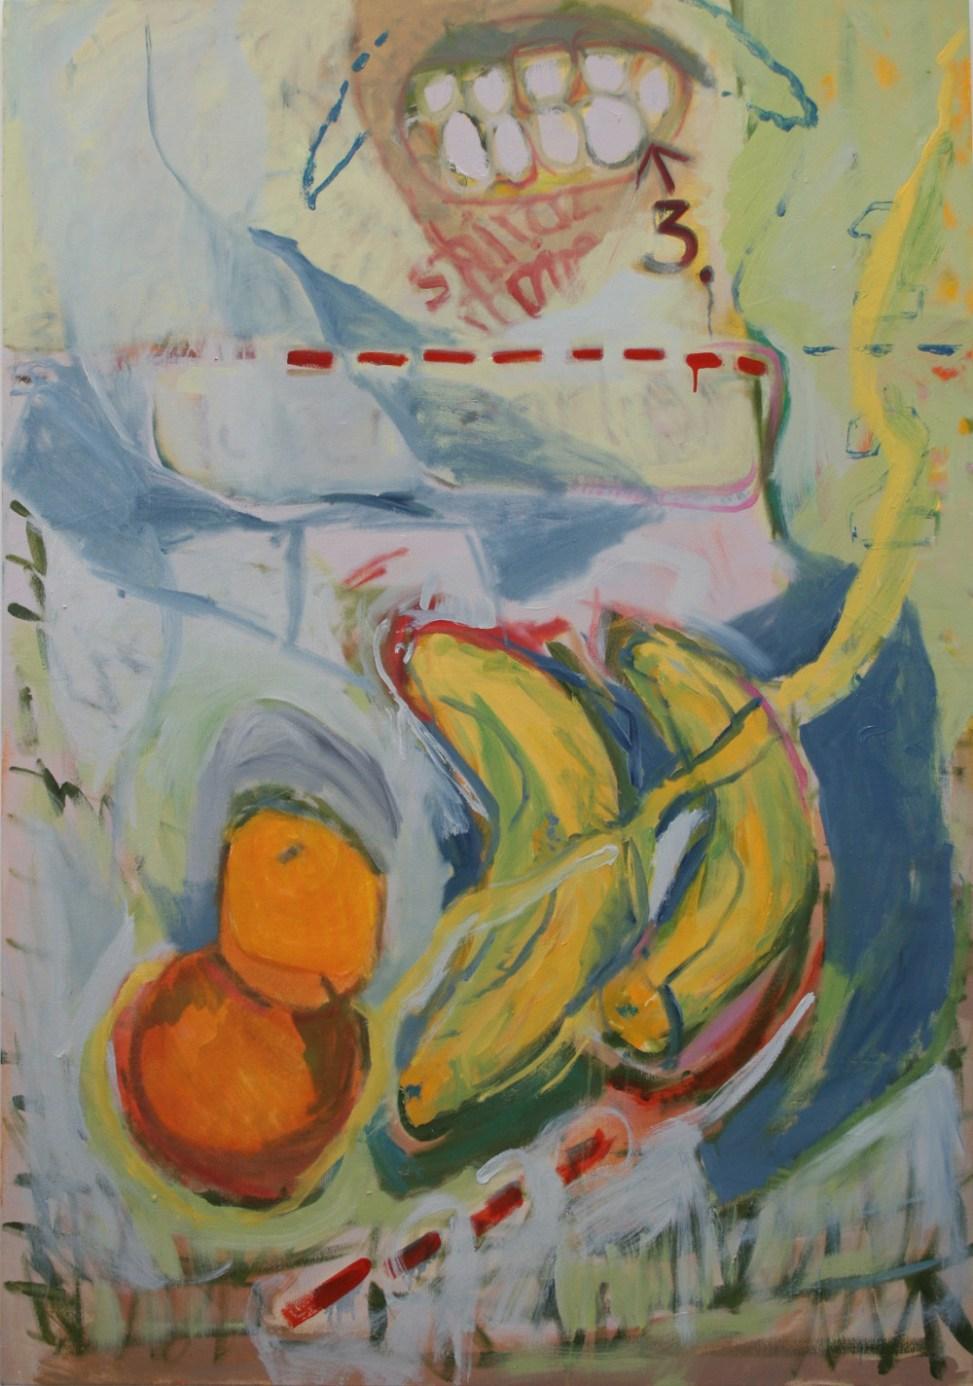 ShirazatsumaOil on canvas. 100cm x 142cm.